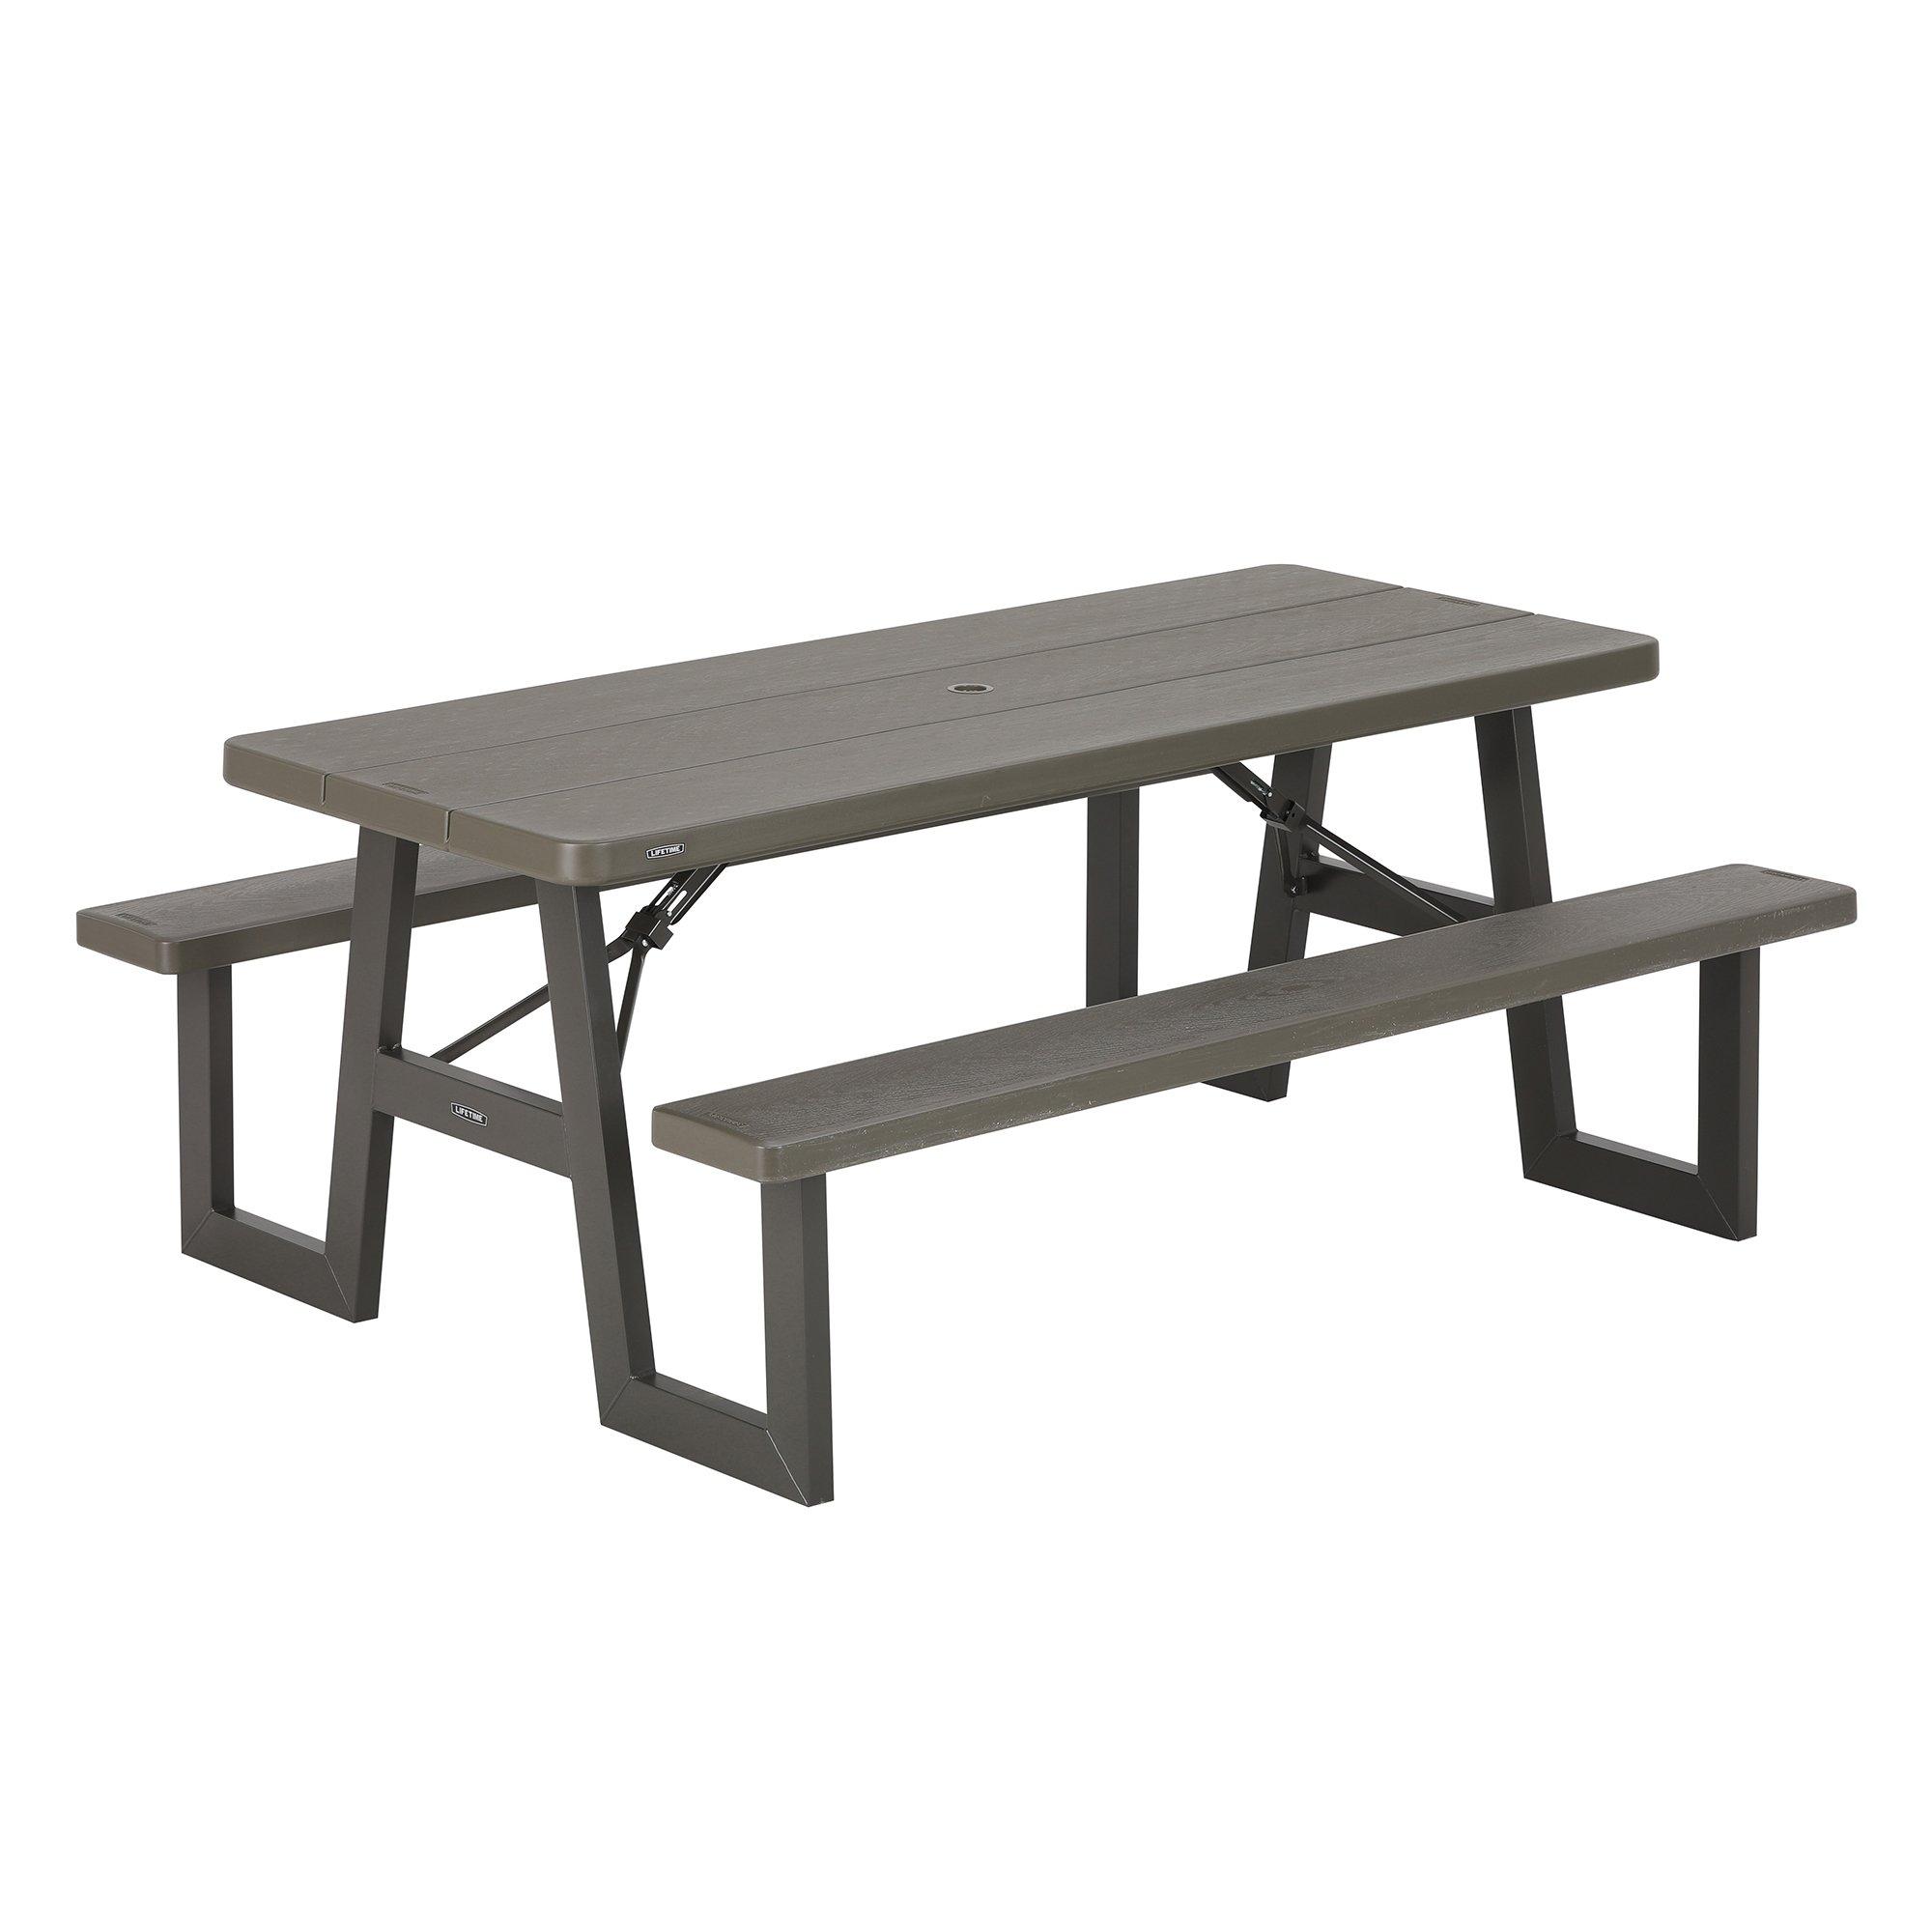 Lifetime 60233 W-Frame Picnic Table by Lifetime